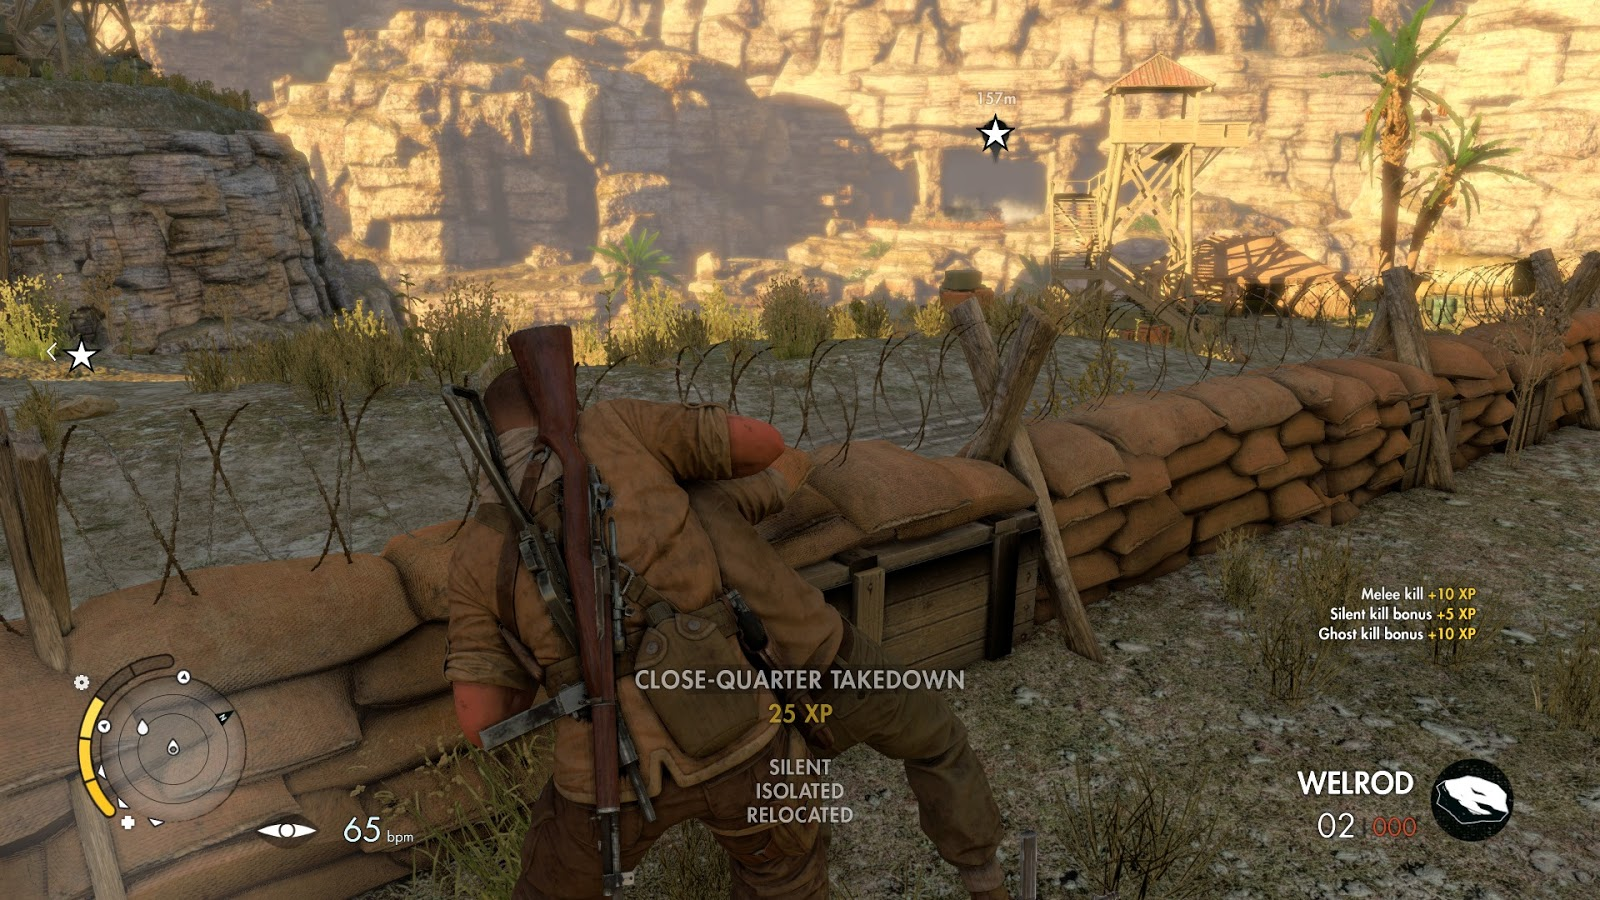 ... Software to Start Downloading Sniper Elite 3 PC Game Free Download